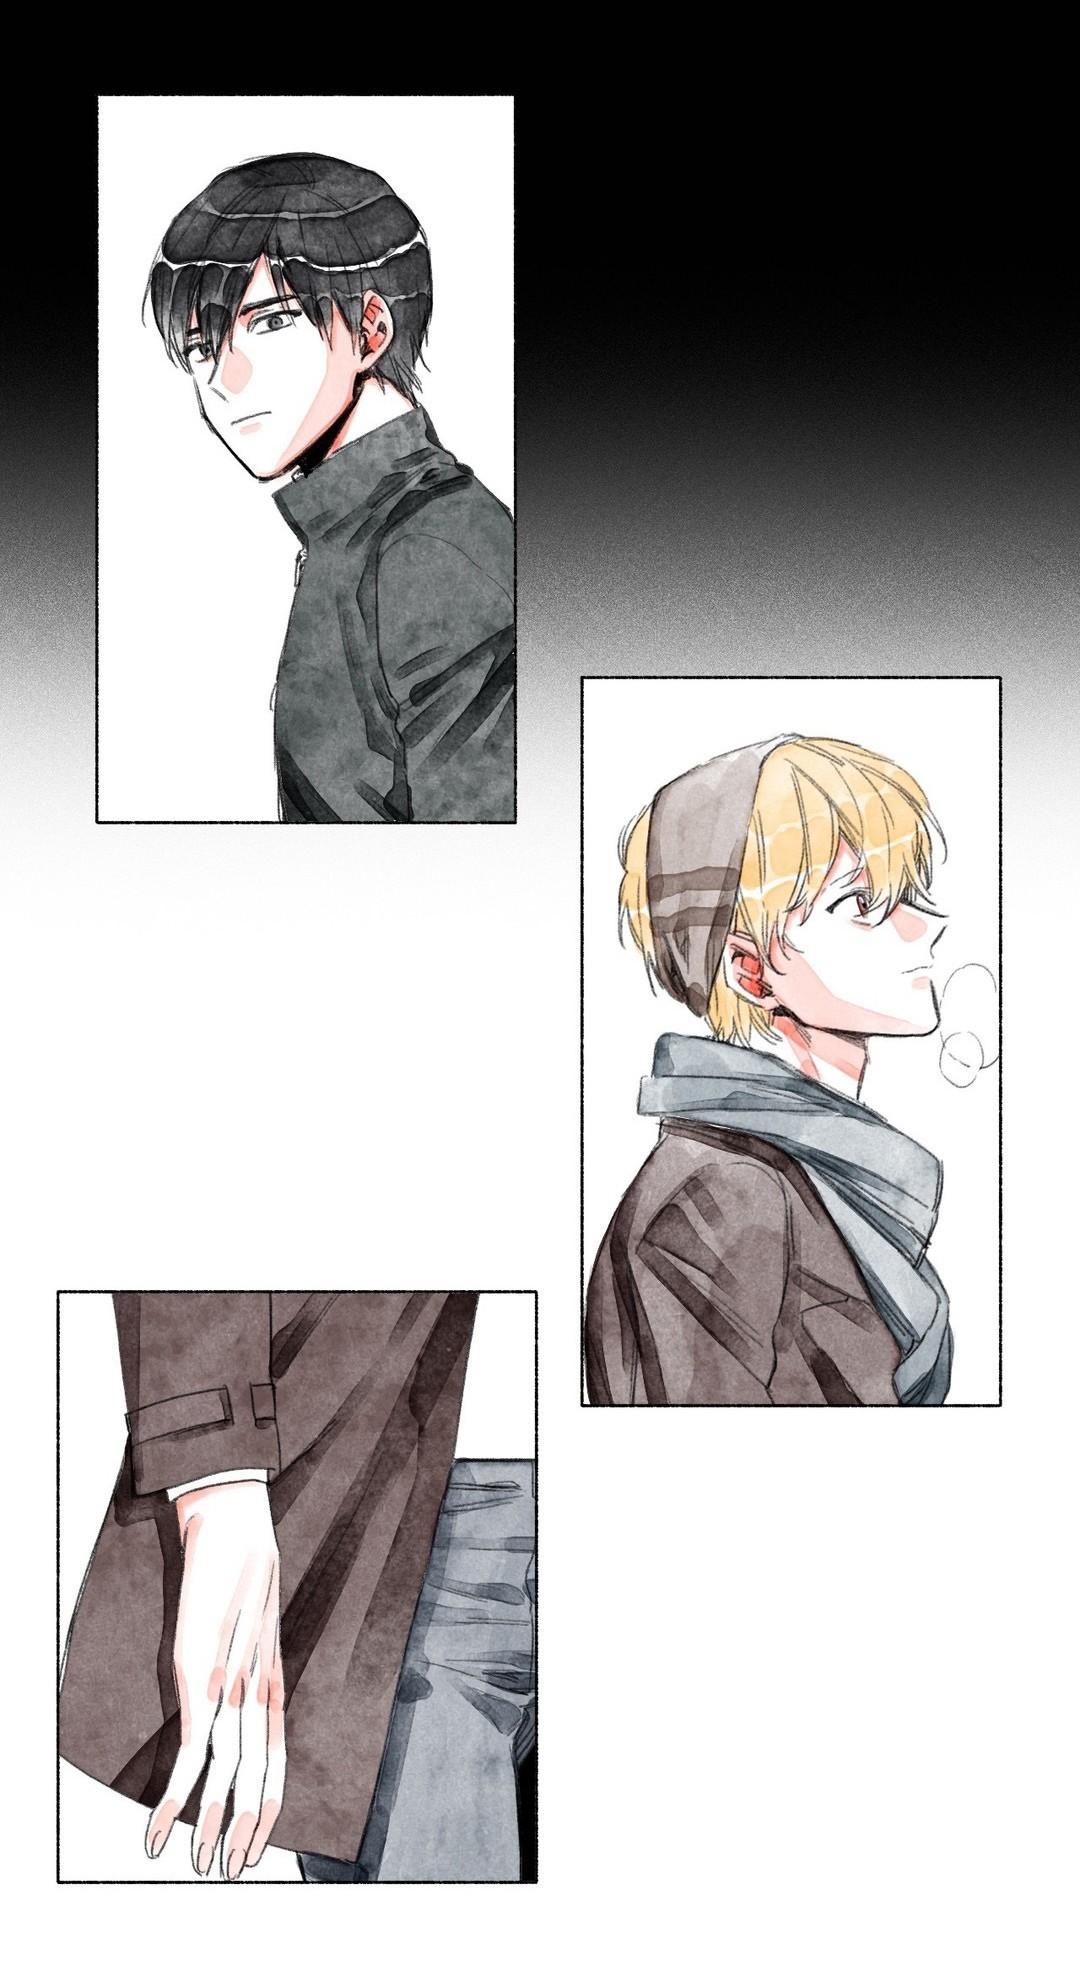 https://r2.ninemanga.com/comics/pic4/36/37860/1339494/1557622962681.jpg Page 13